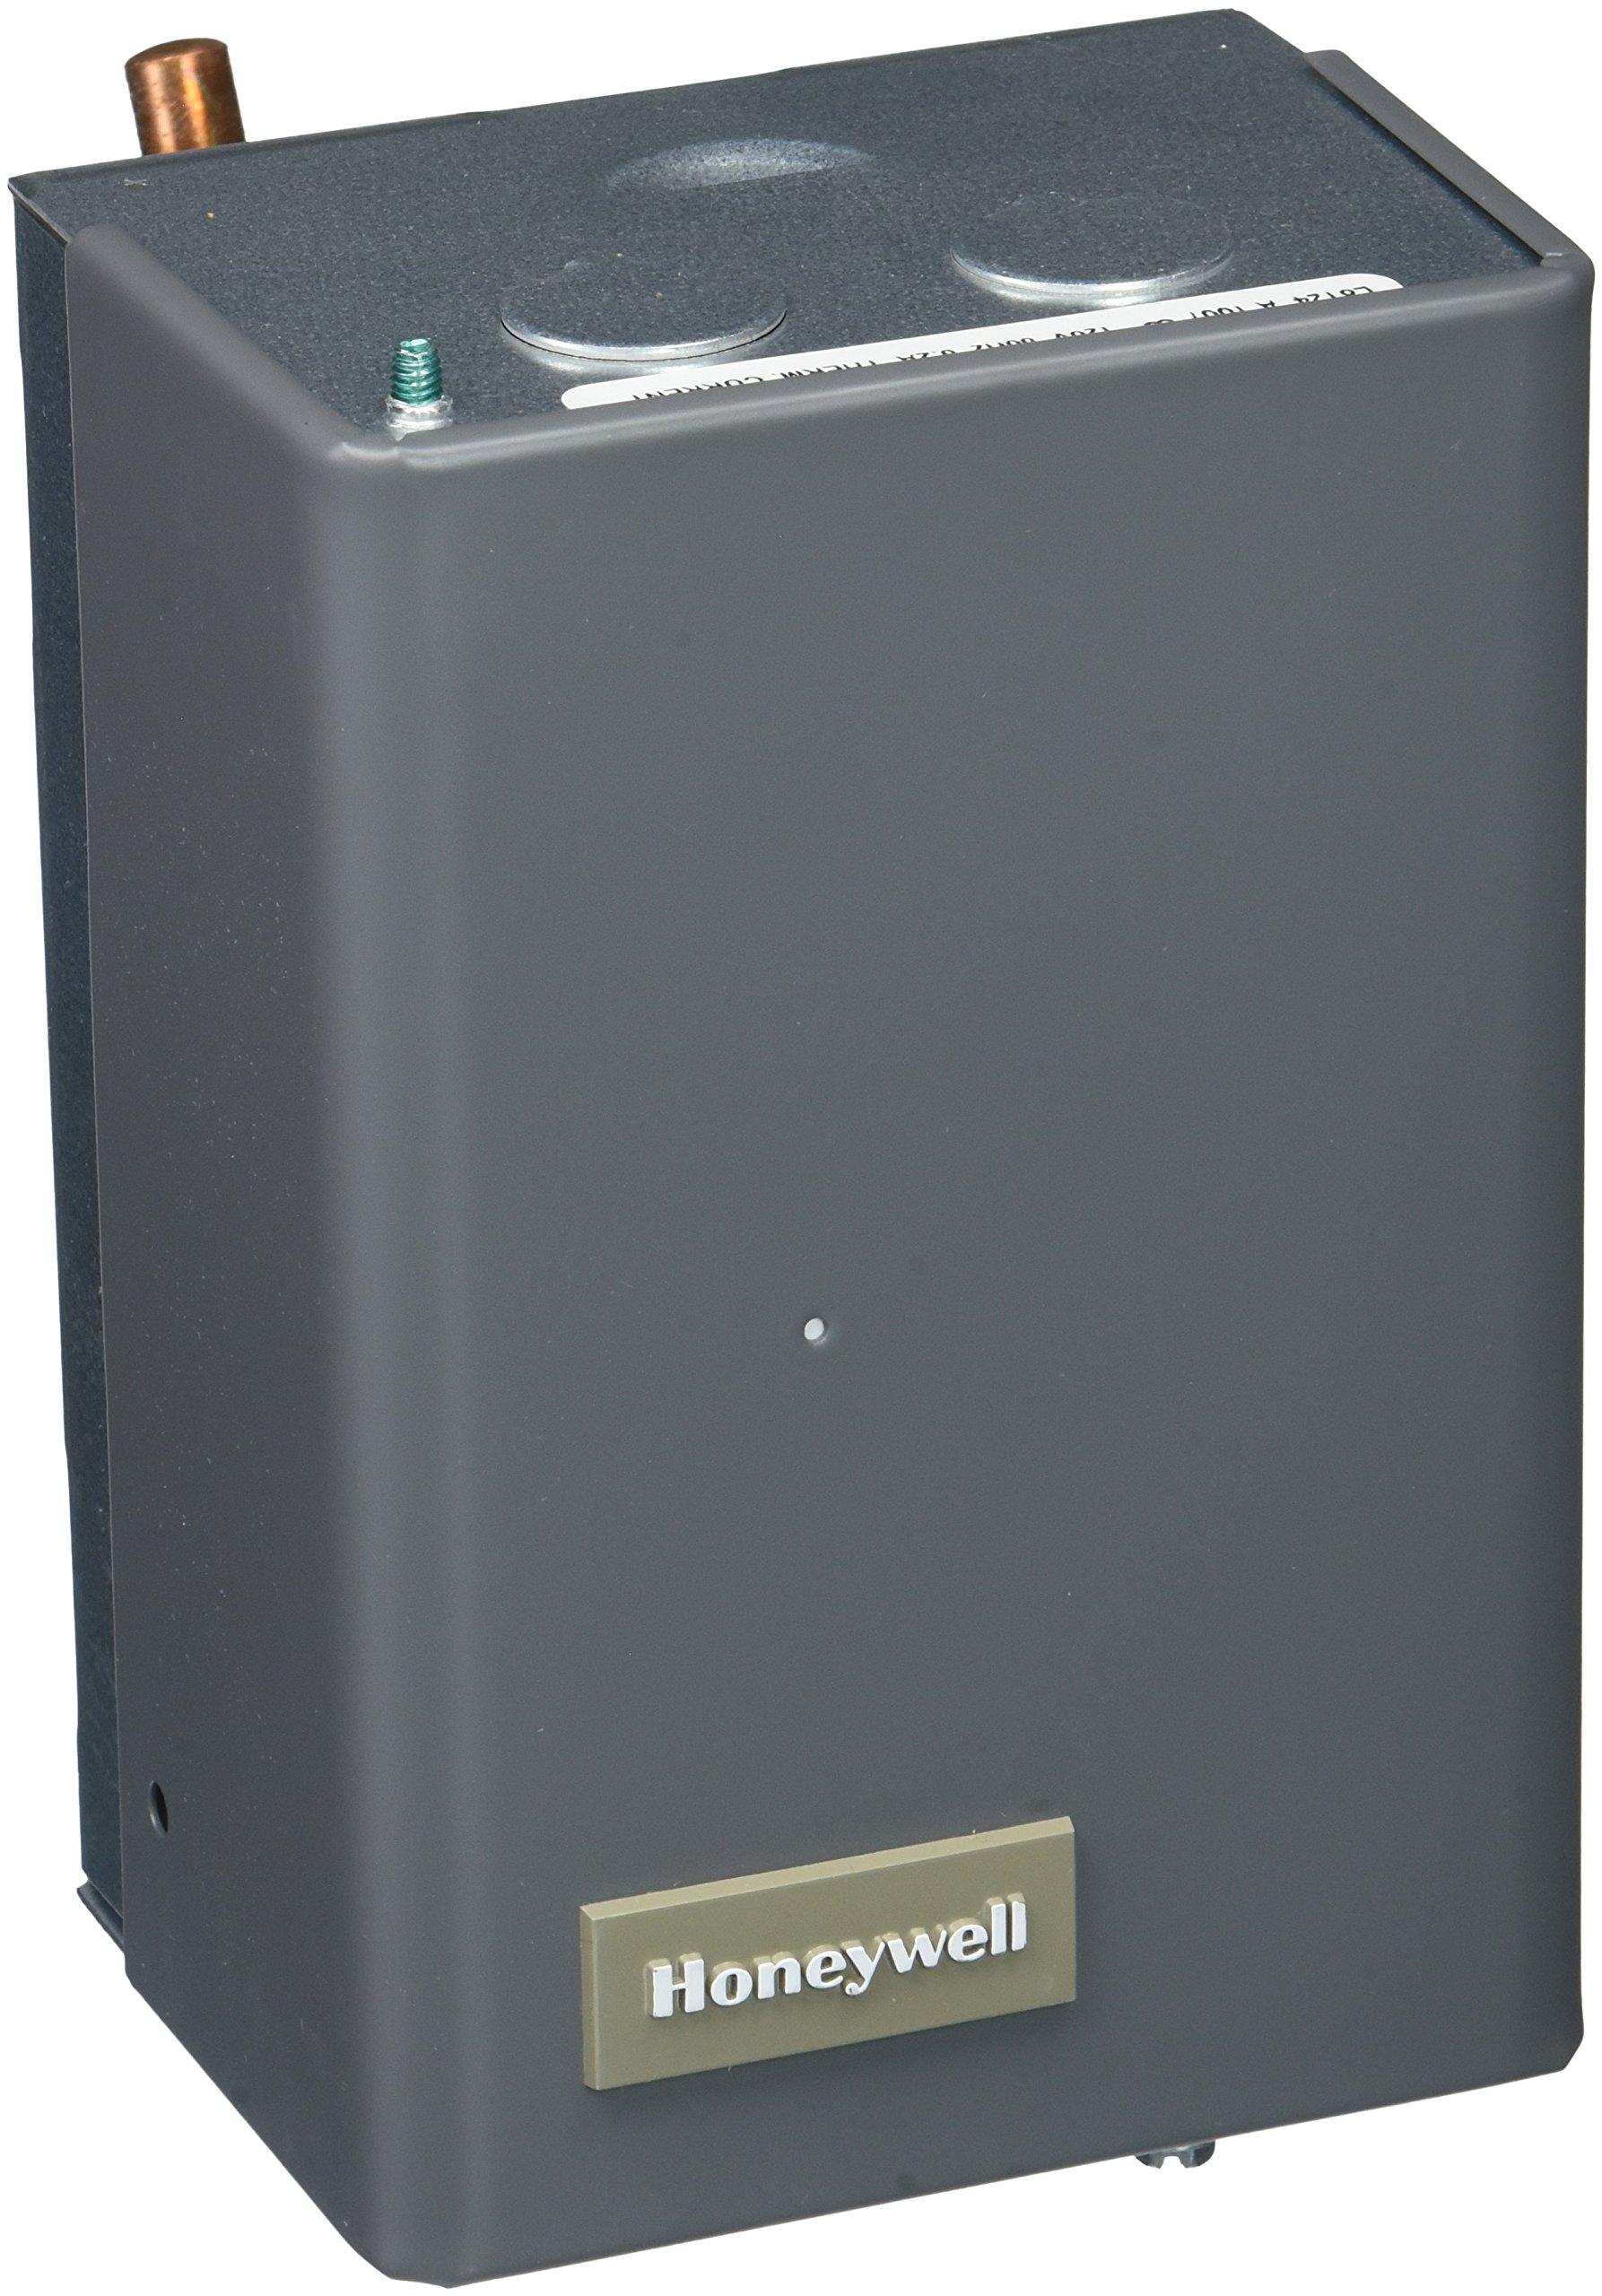 Honeywell L8124A-1007 Triple Aquastat Vertical Case Relay for Oil Applications, 1.5''